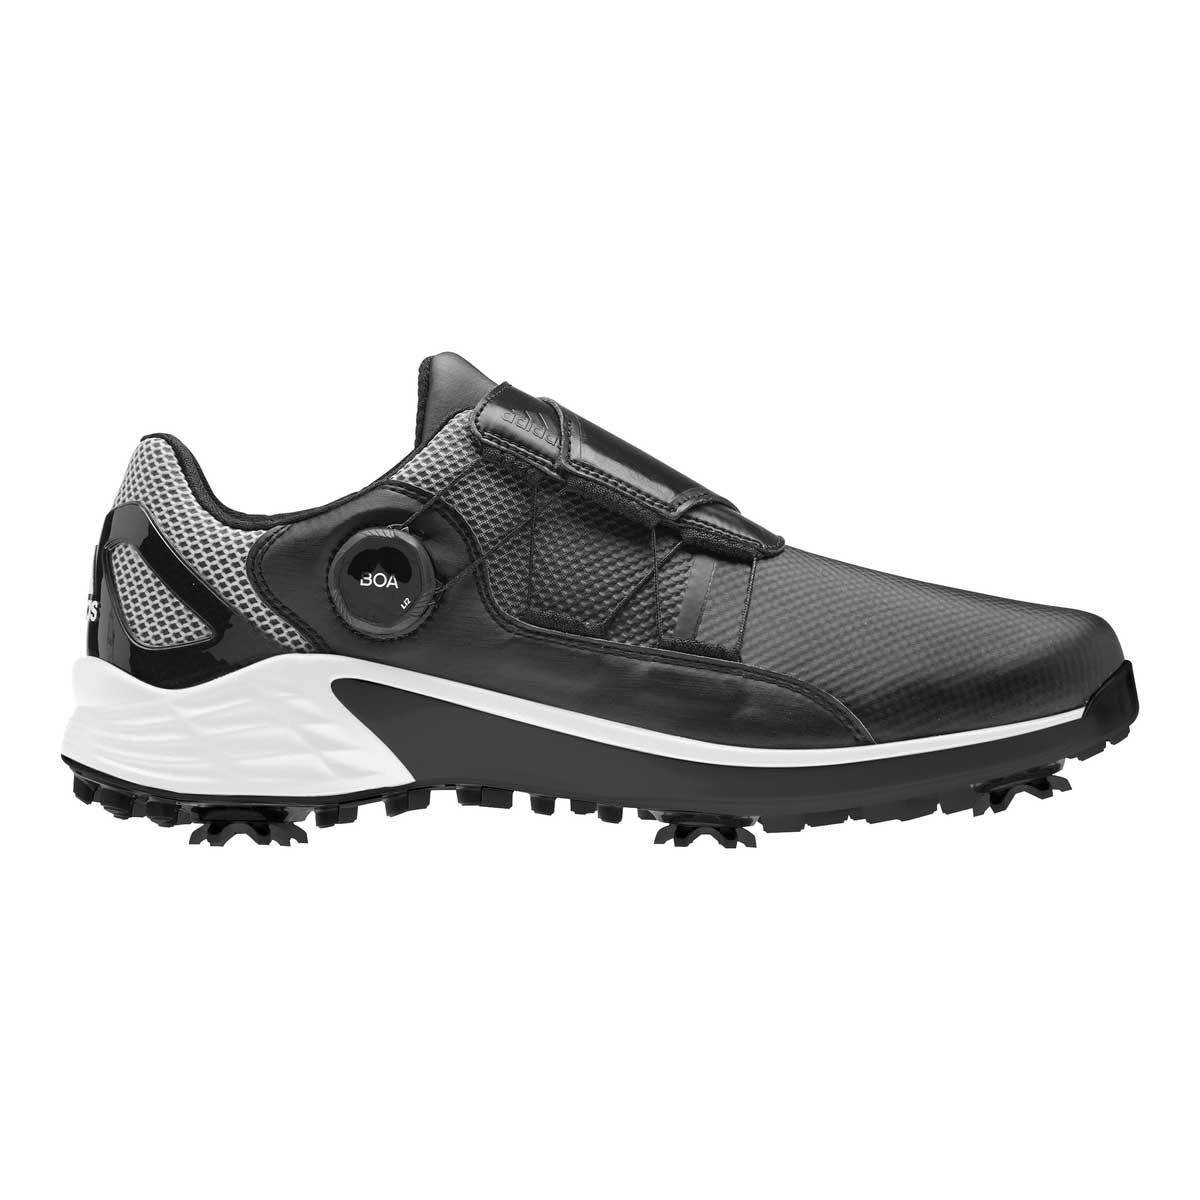 Adidas Men's ZG21 BOA Black Golf Shoe